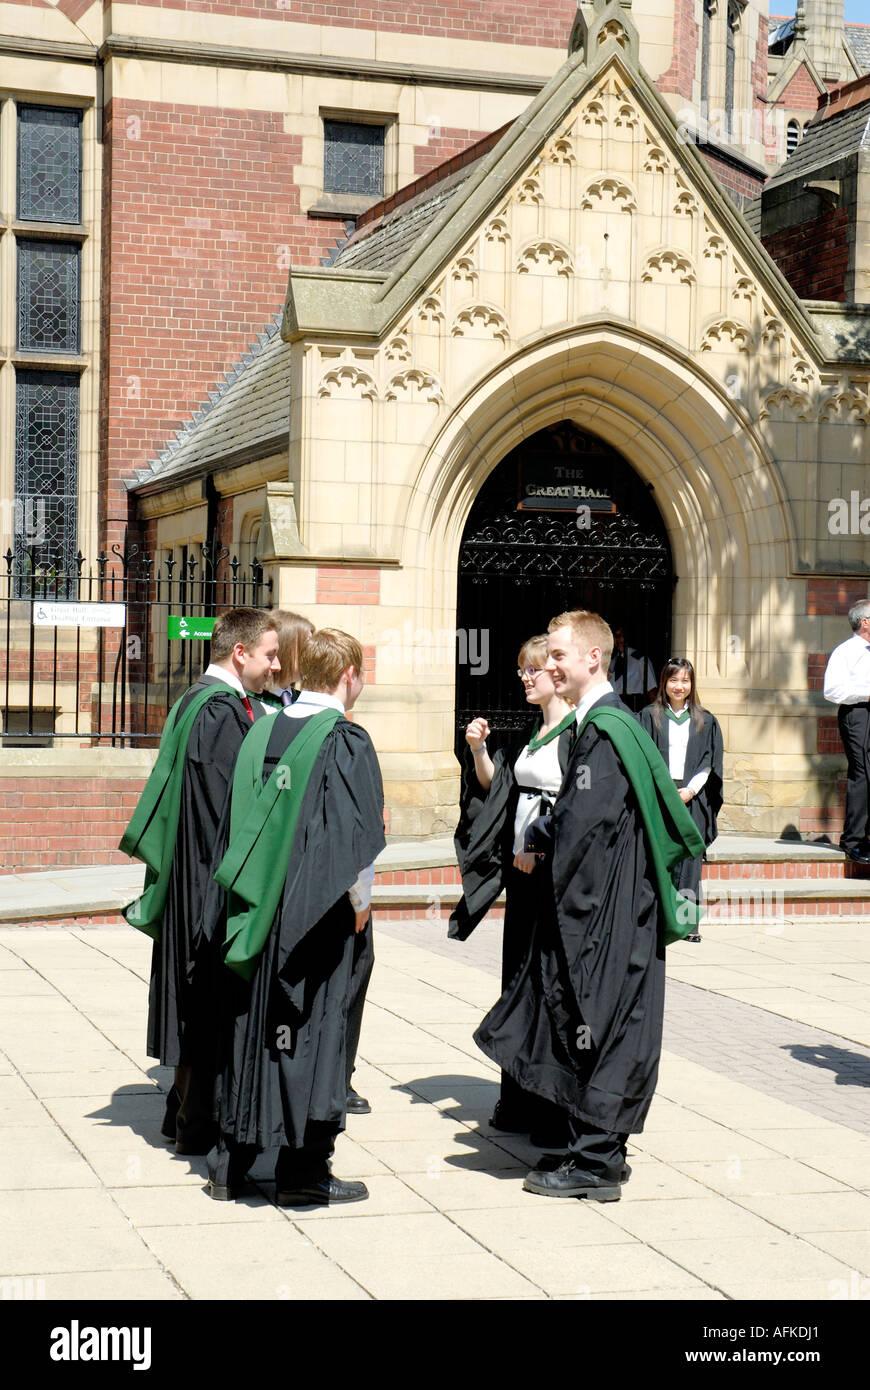 Leeds University Graduation Day Stock Photo 7982304 Alamy